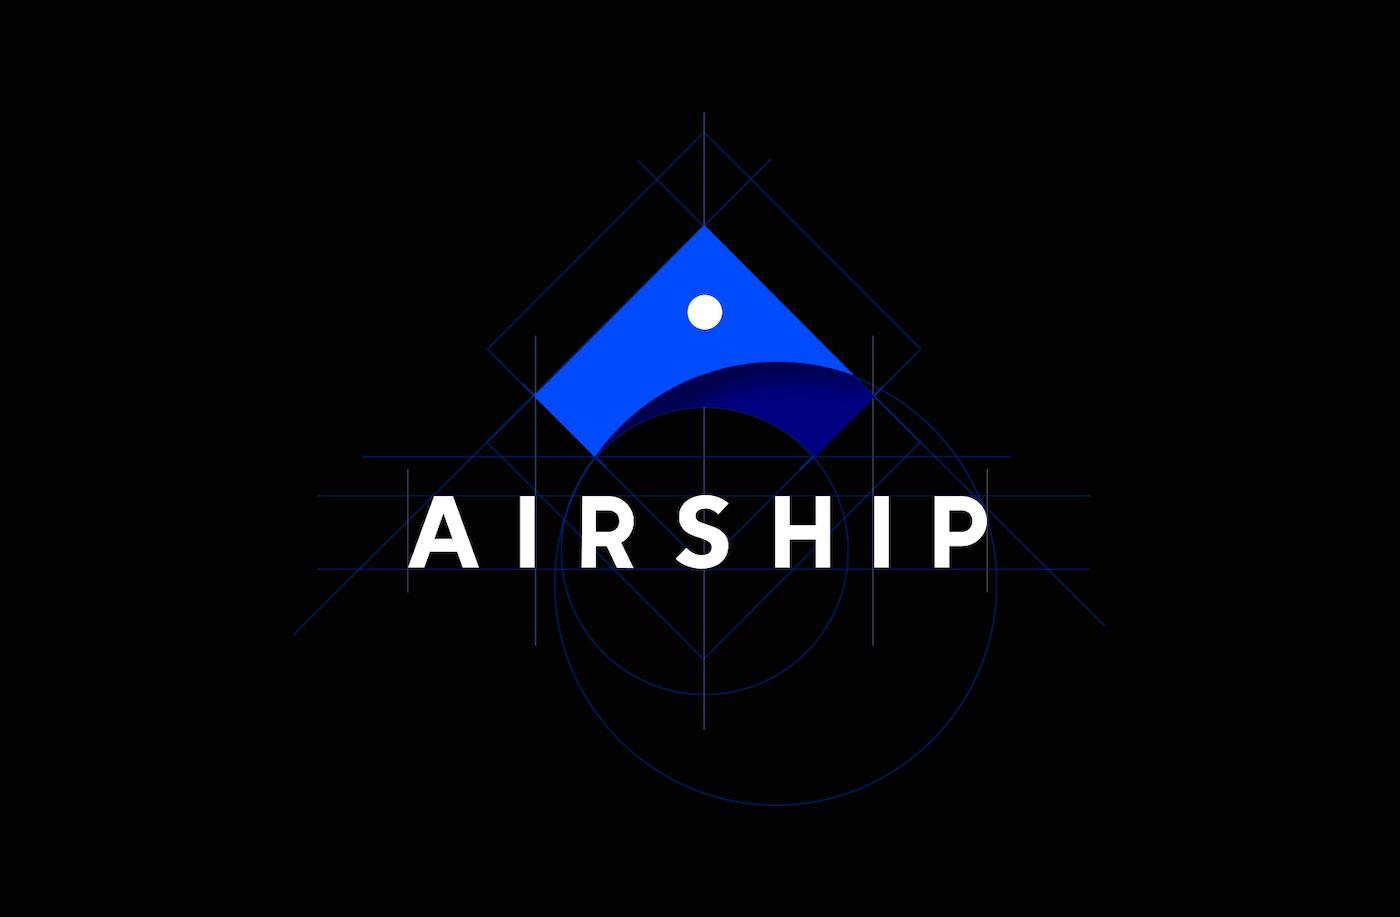 Urban Airship is now Airship